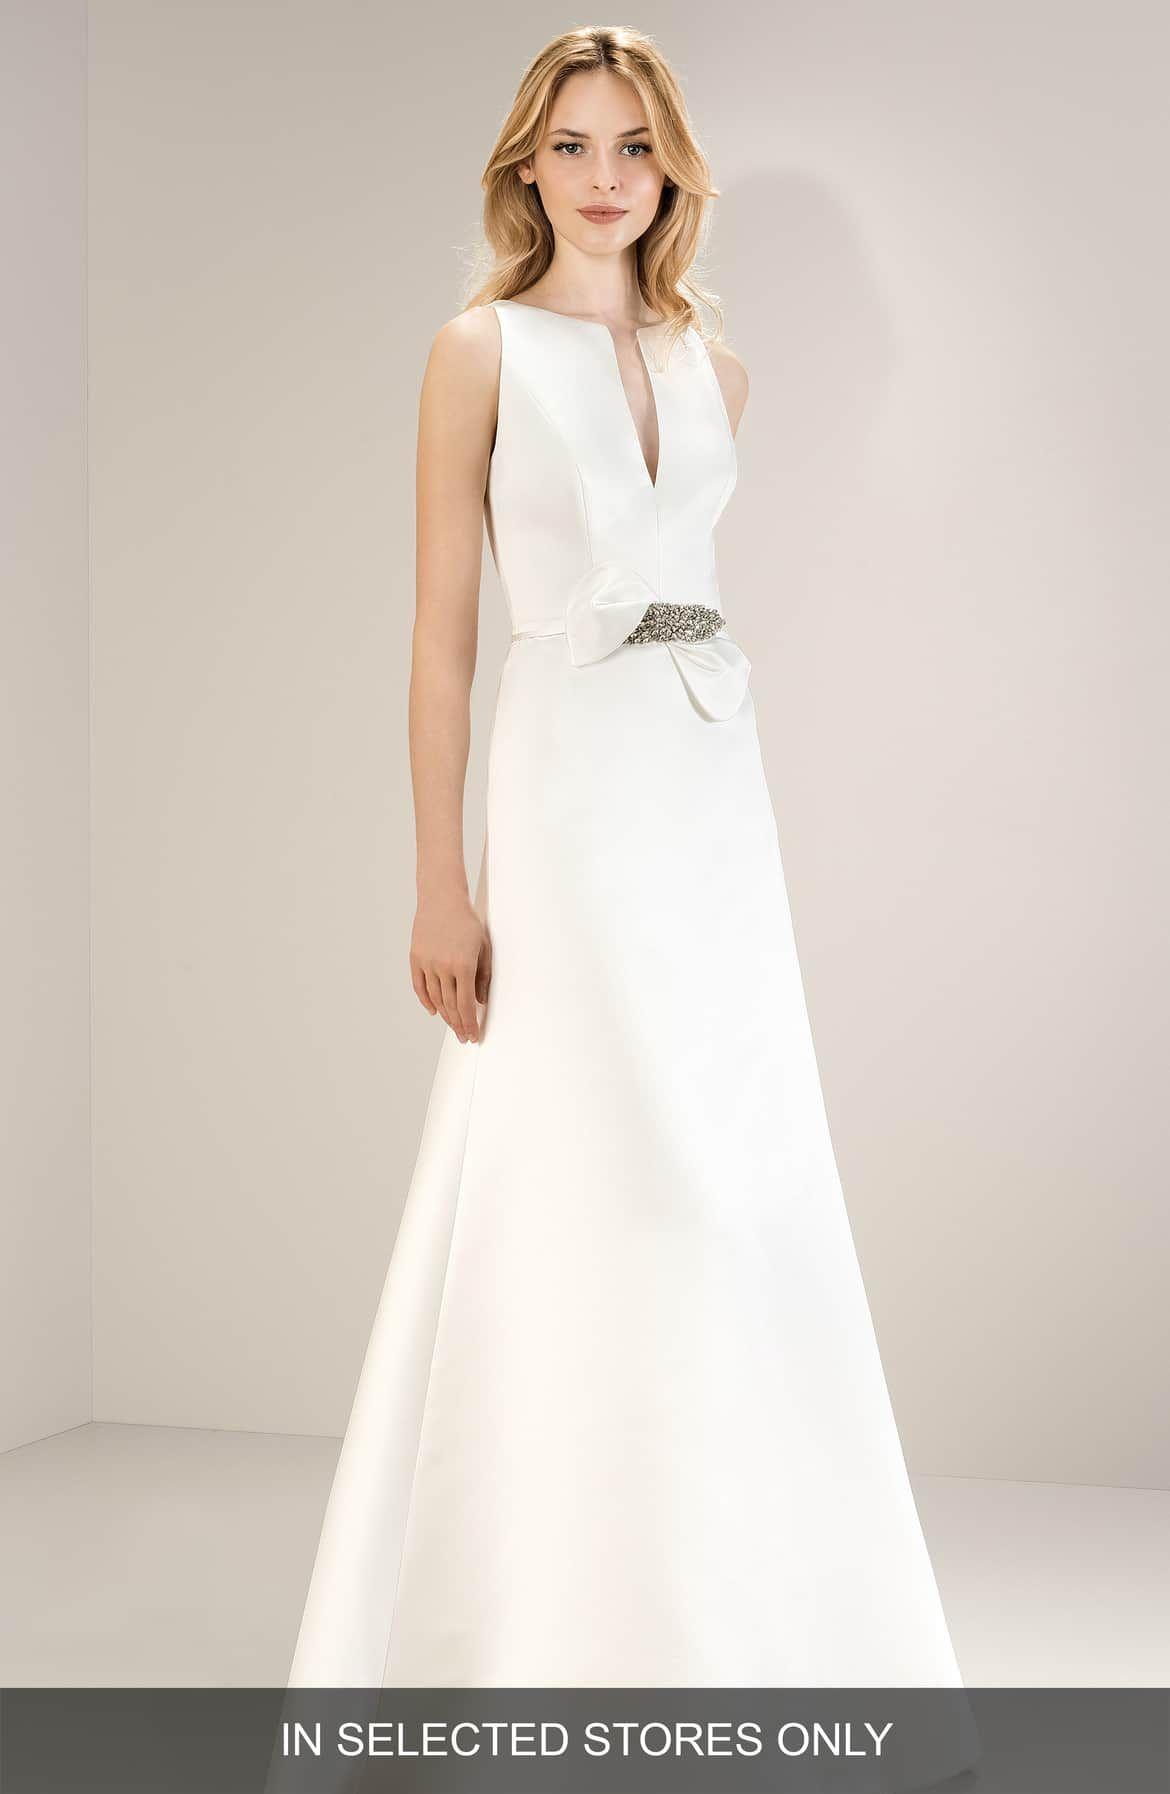 Nordstrom Wedding Dresses.Jesus Peiro Sleeveless Split Neck Satin Gown Nordstrom